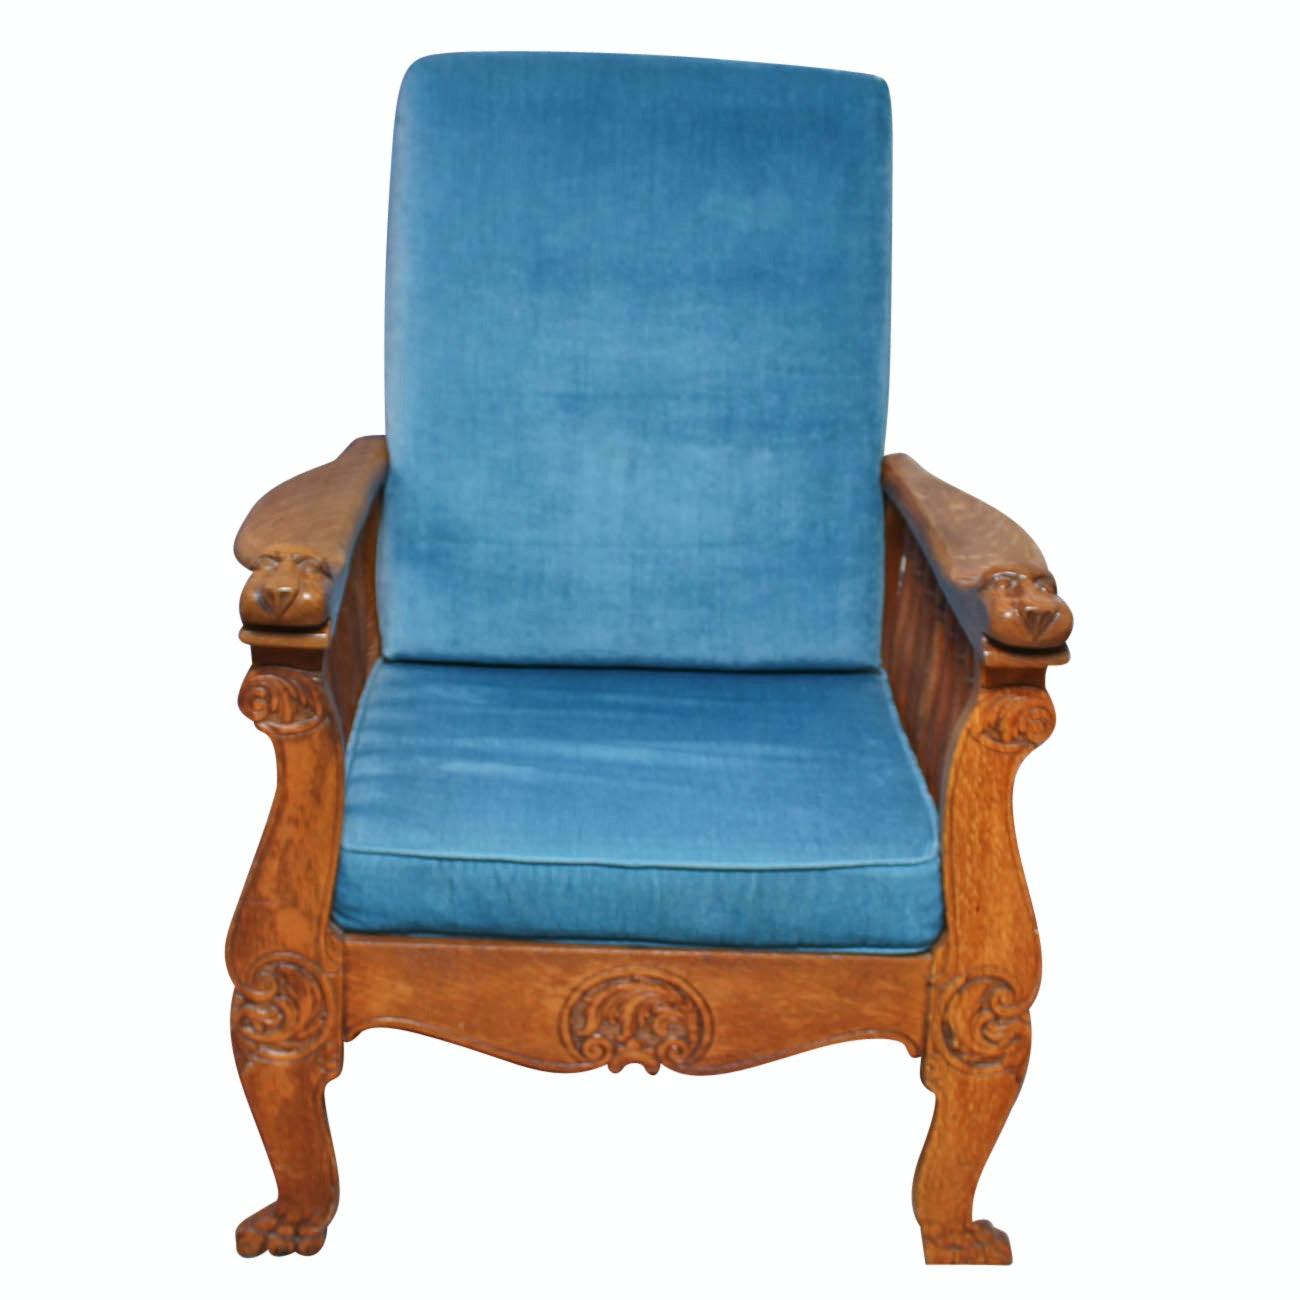 Vintage Oak Morris Chair with Carved Lion Hand Rests